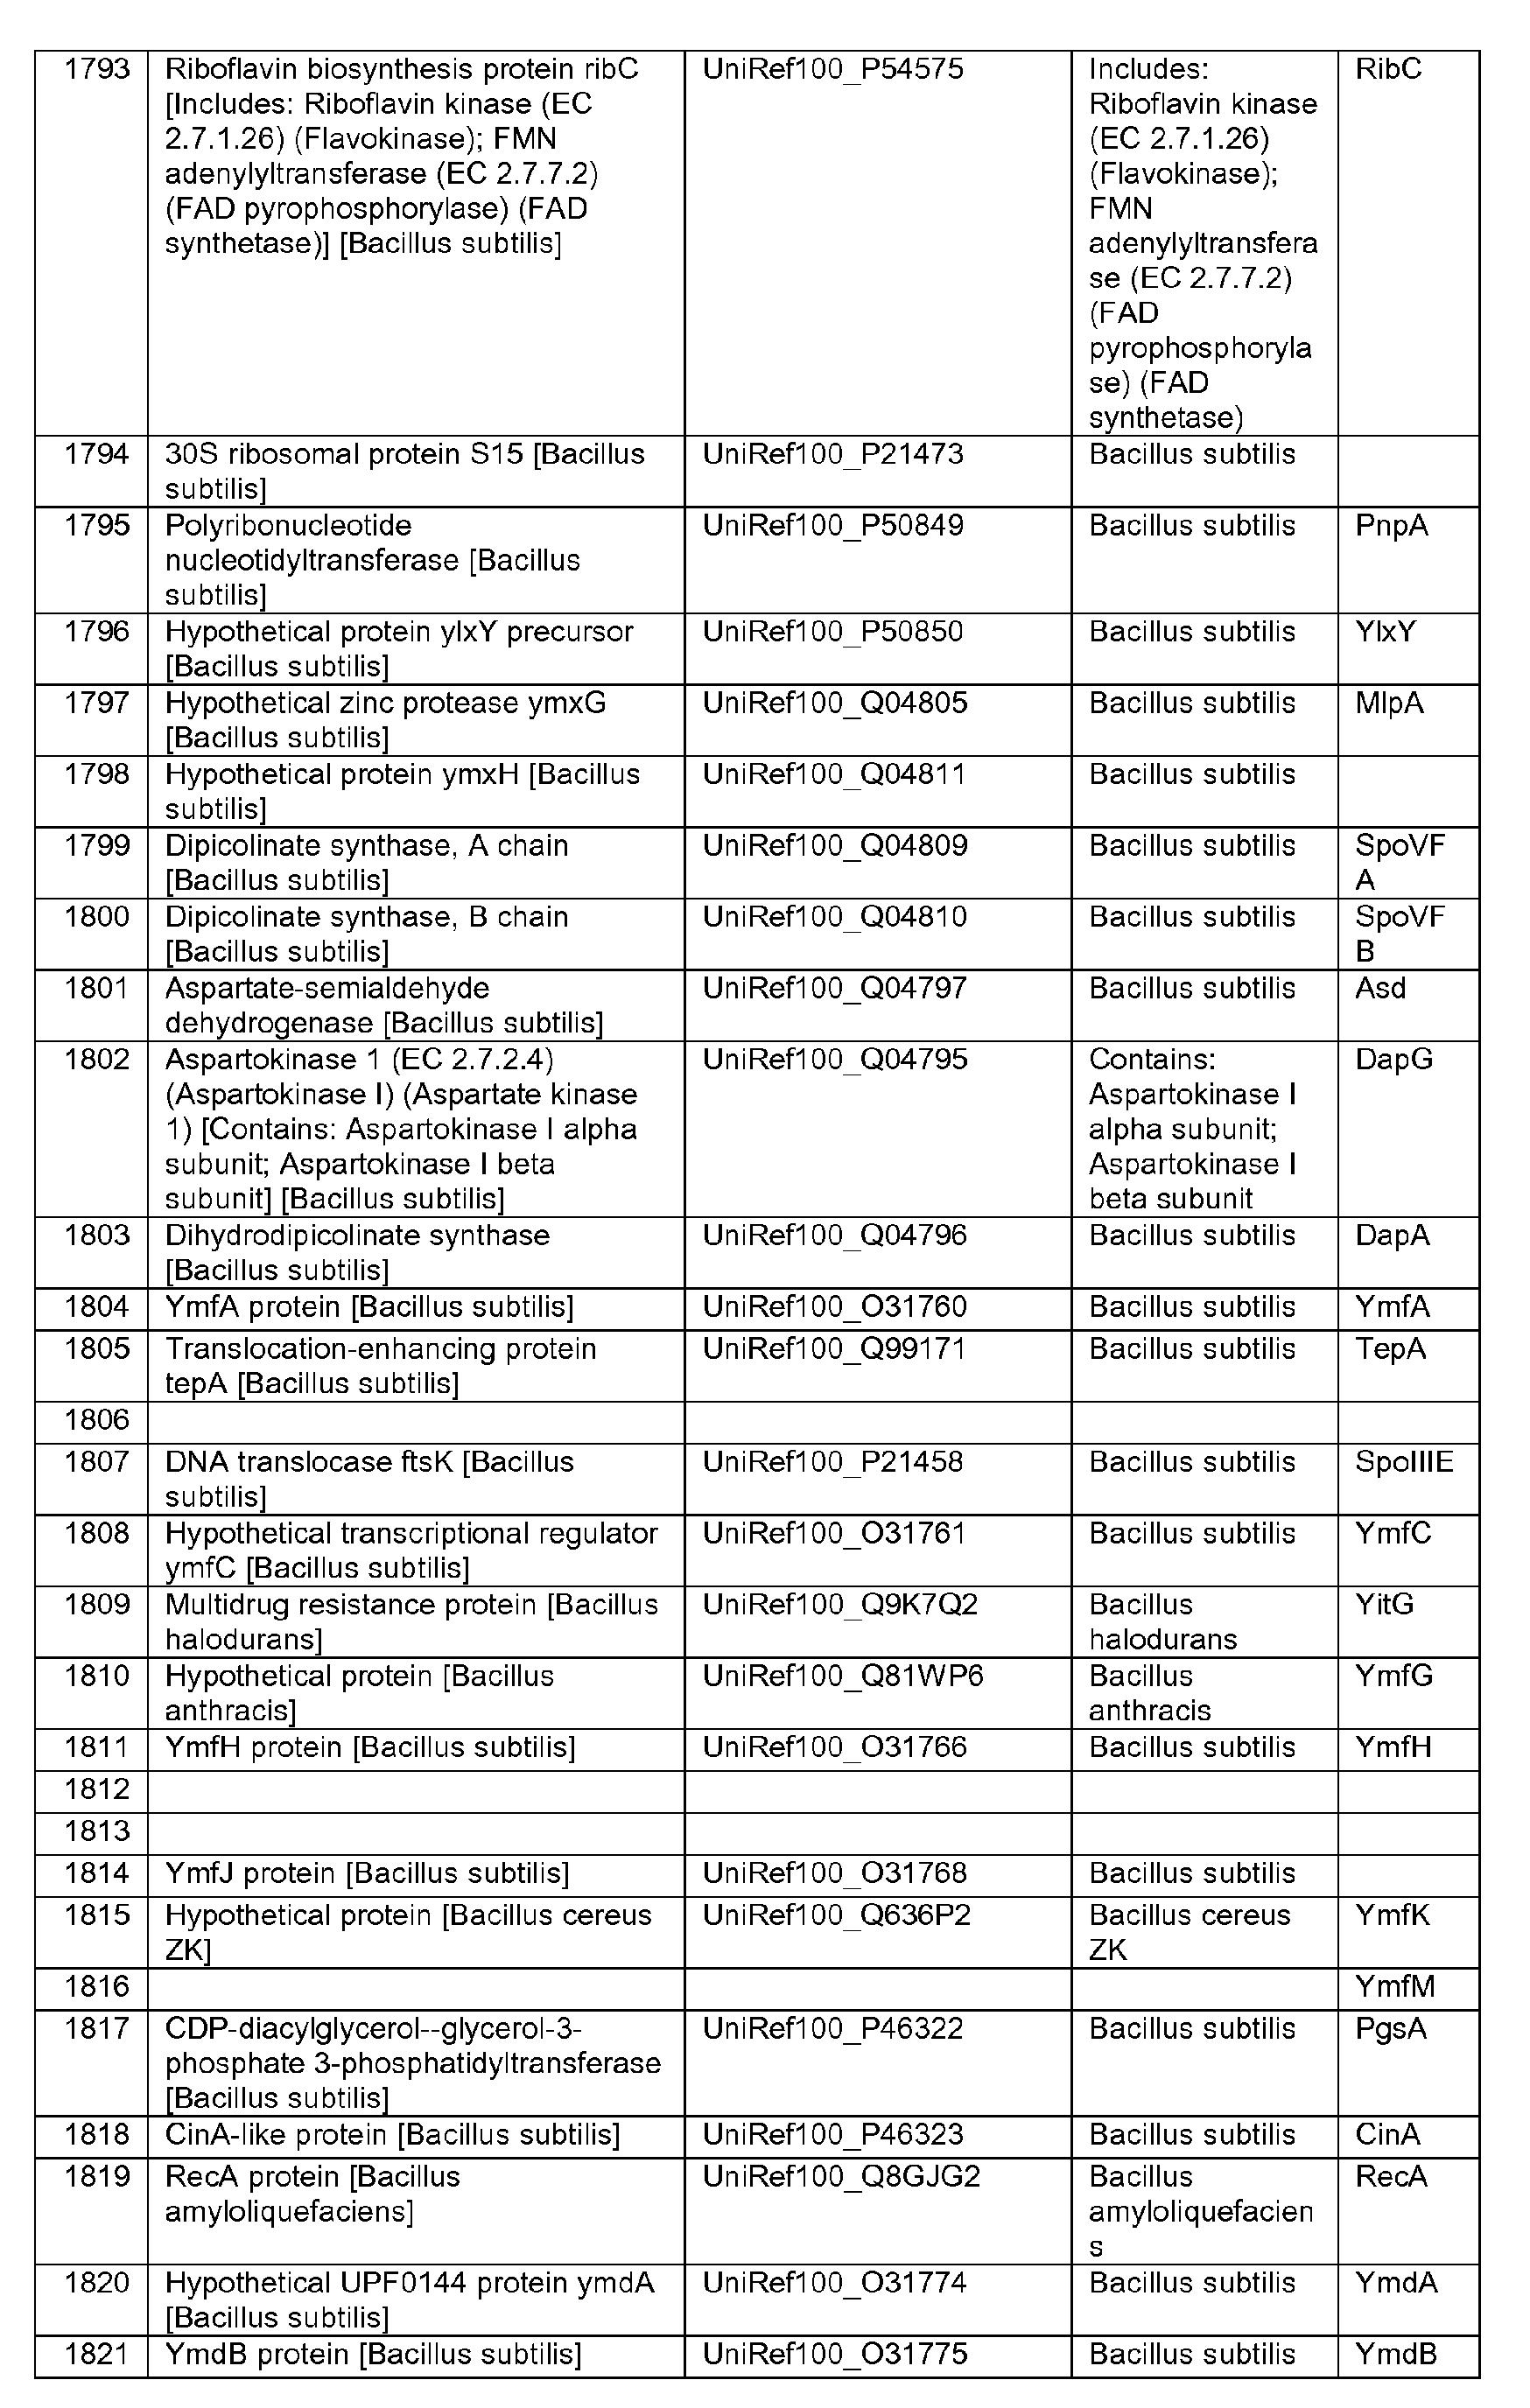 EP2284184A2 - Bacillus YvmA inactivation - Google Patents